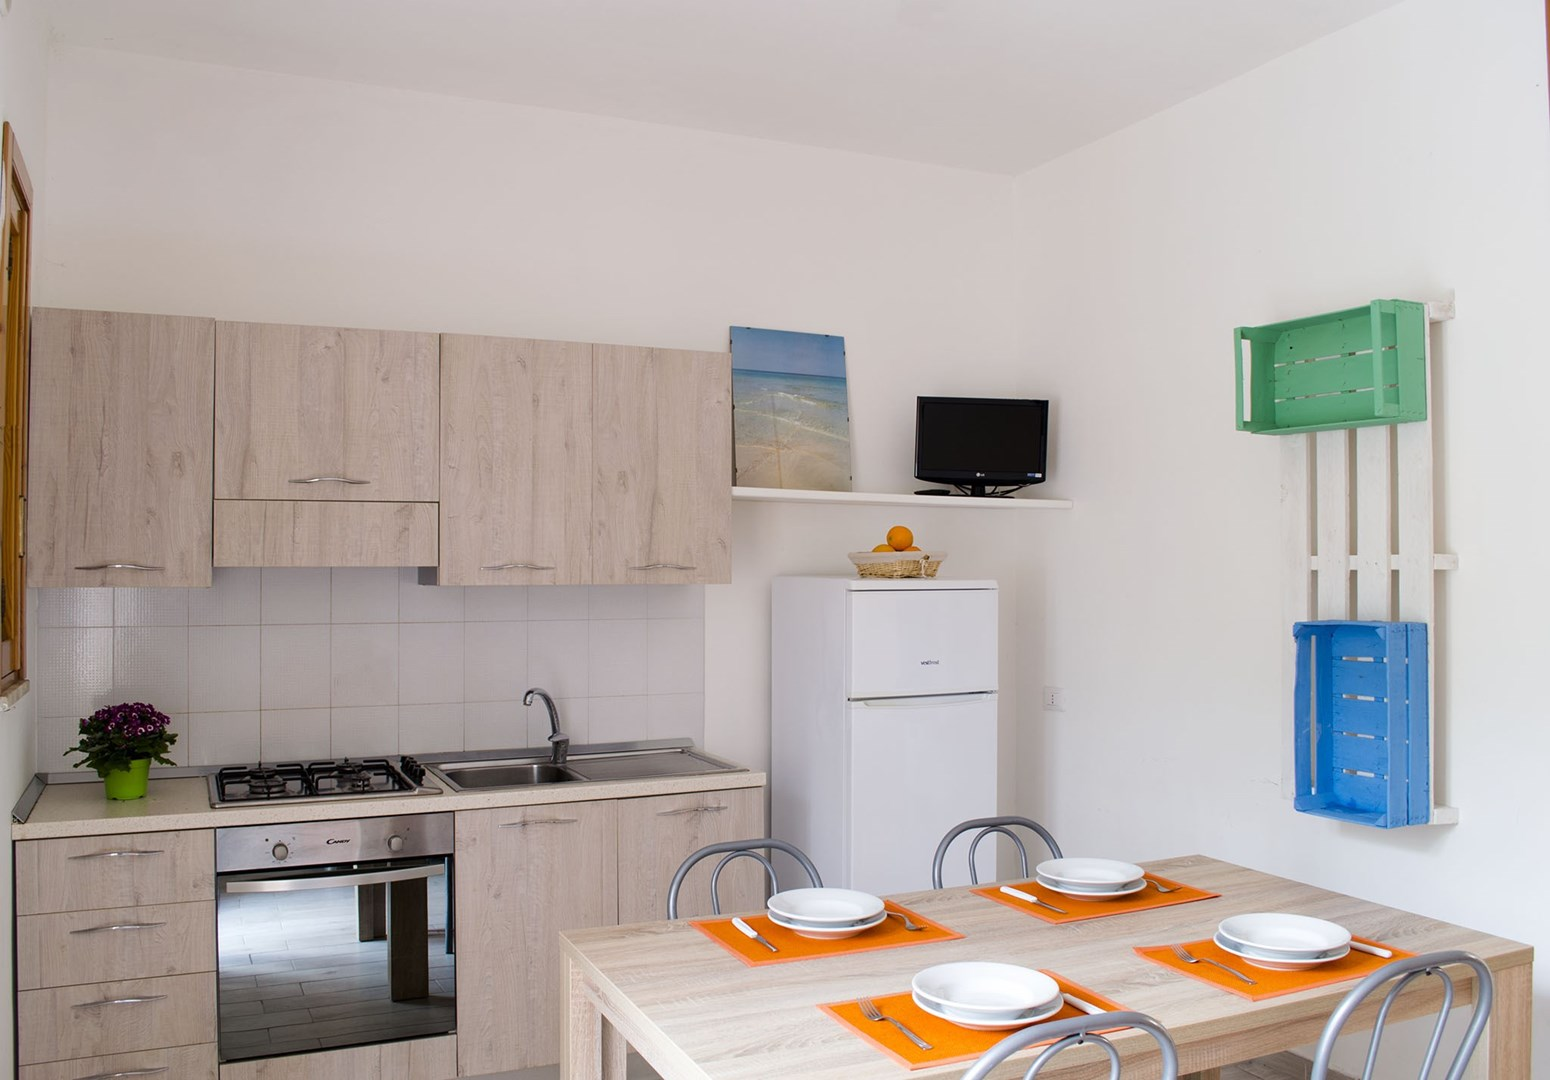 6_residence-borgo-latino_residence_borgo_latino_angolo_cottura_trilo.jpg